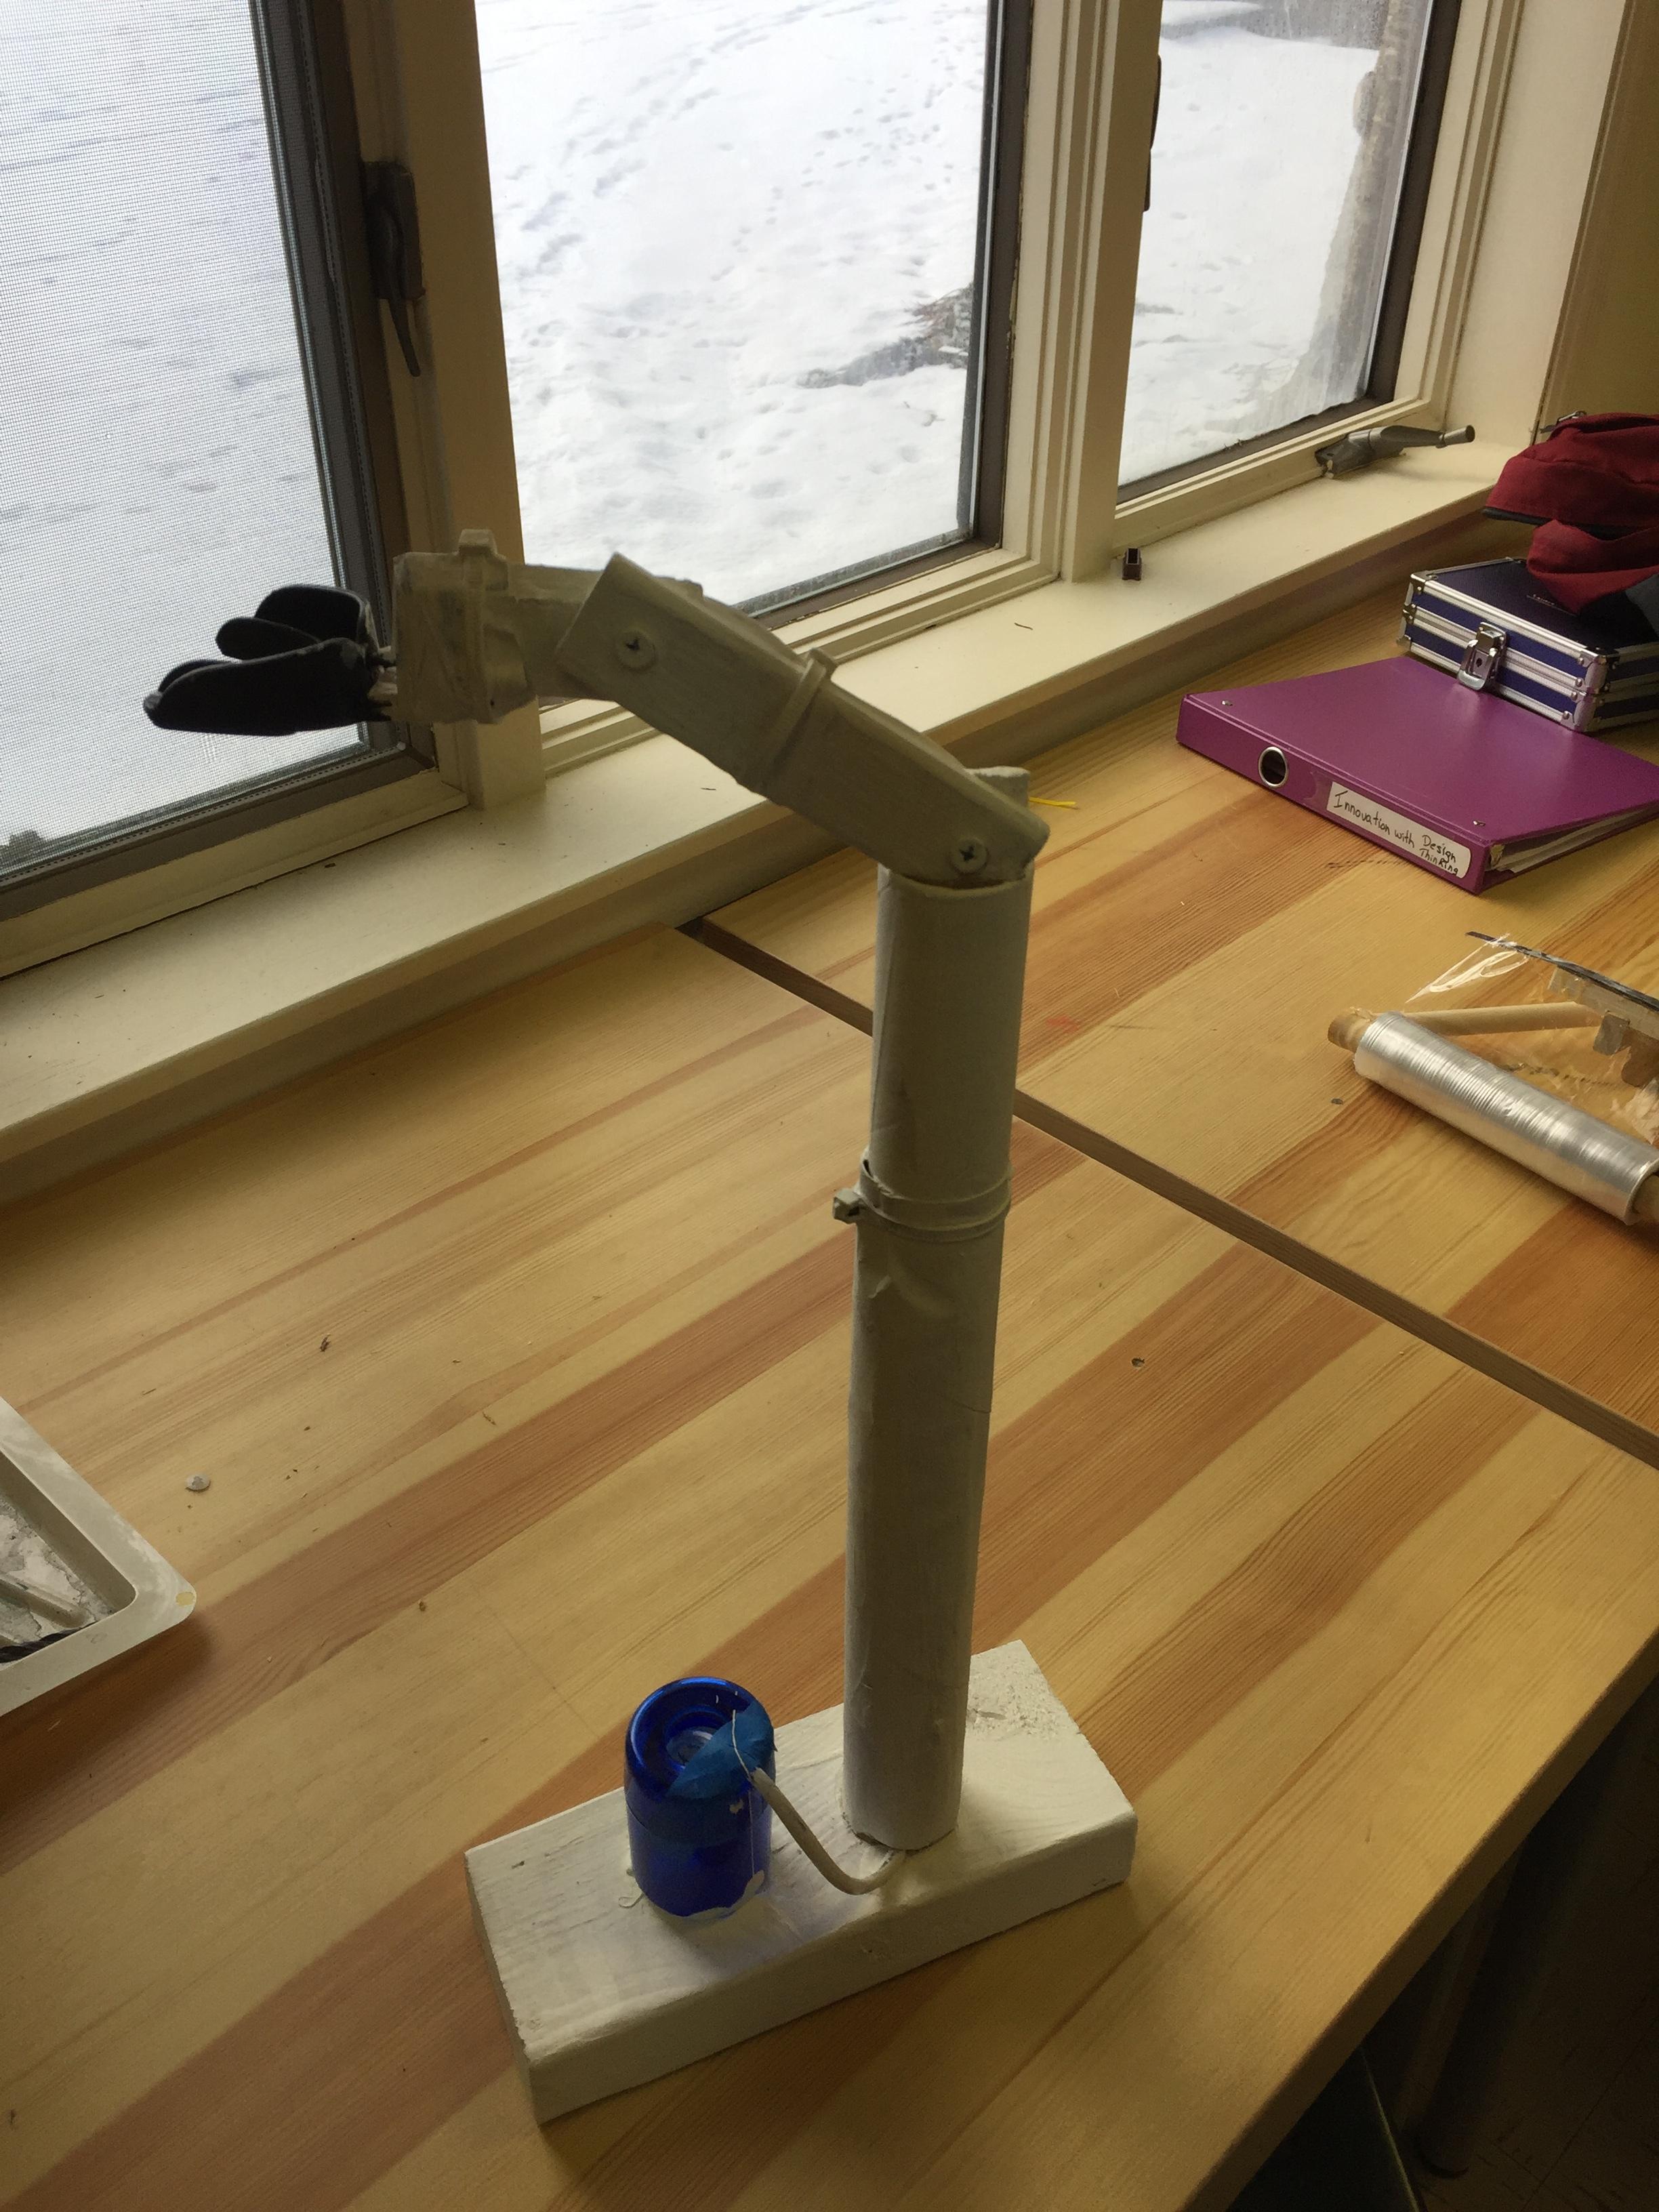 Second Prototype of The Insta-Brush